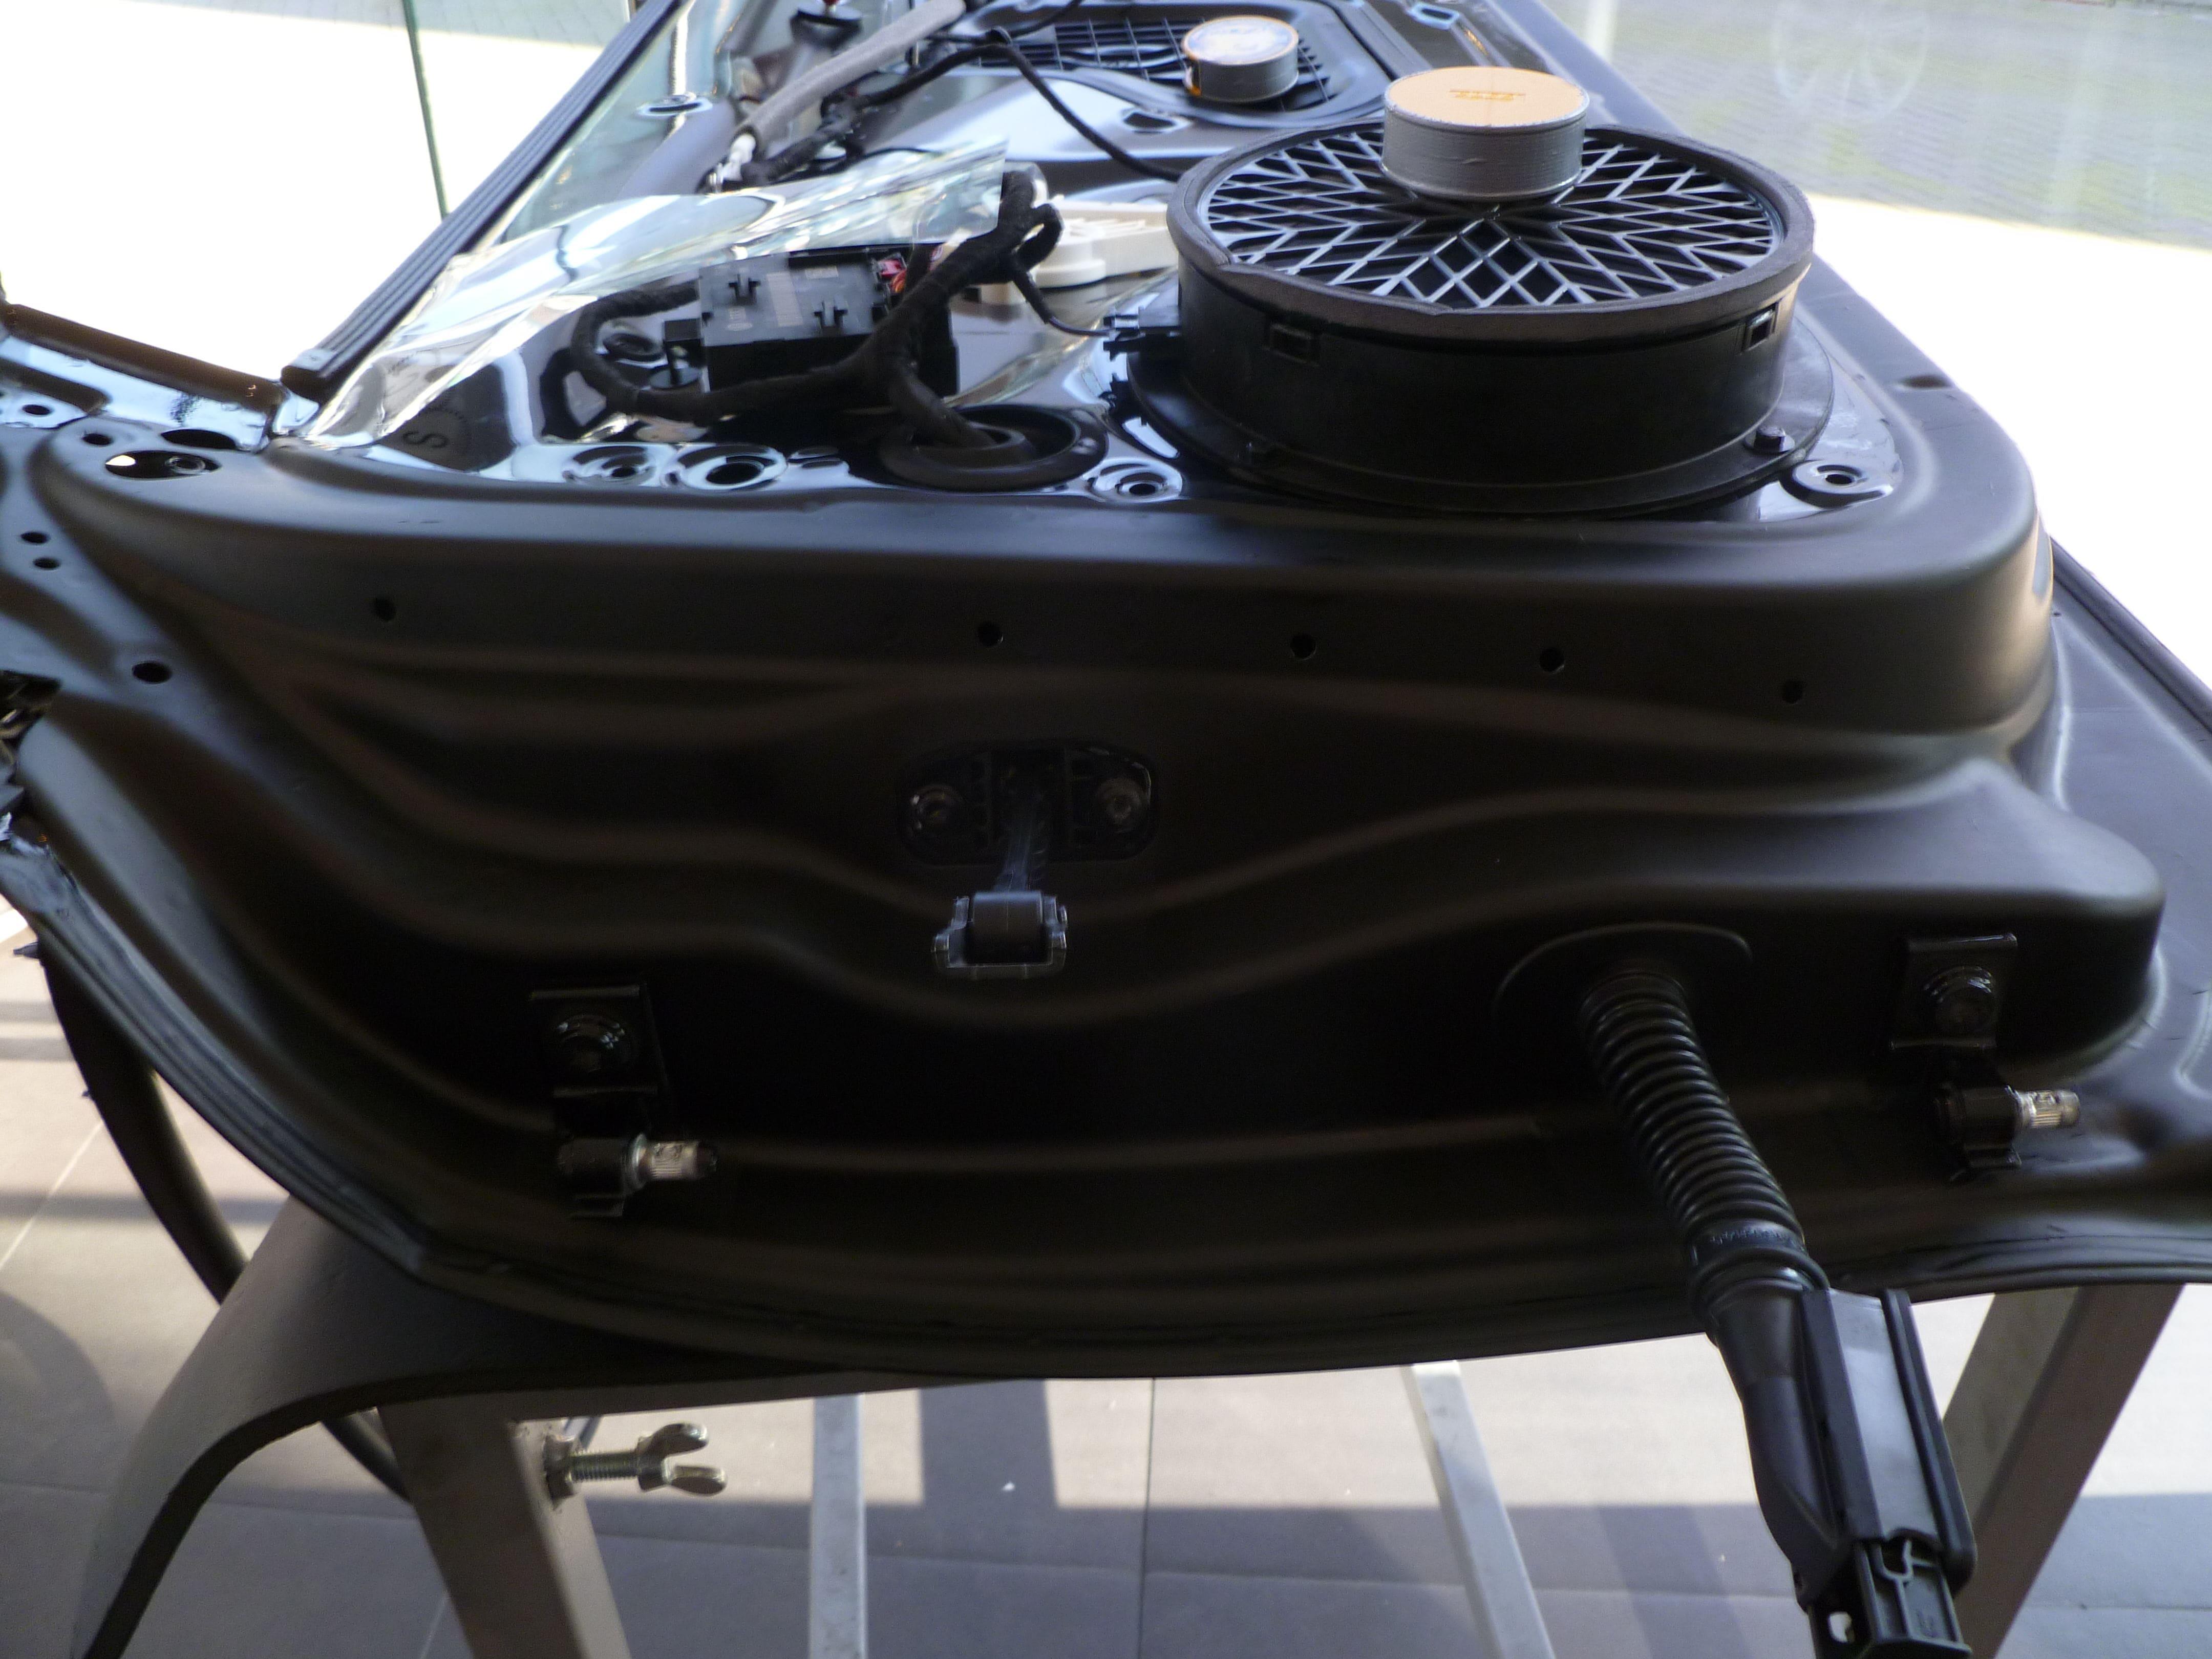 Audi A5 Coupe met Mat Zwarte Wrap, Carwrapping door Wrapmyride.nu Foto-nr:4637, ©2021